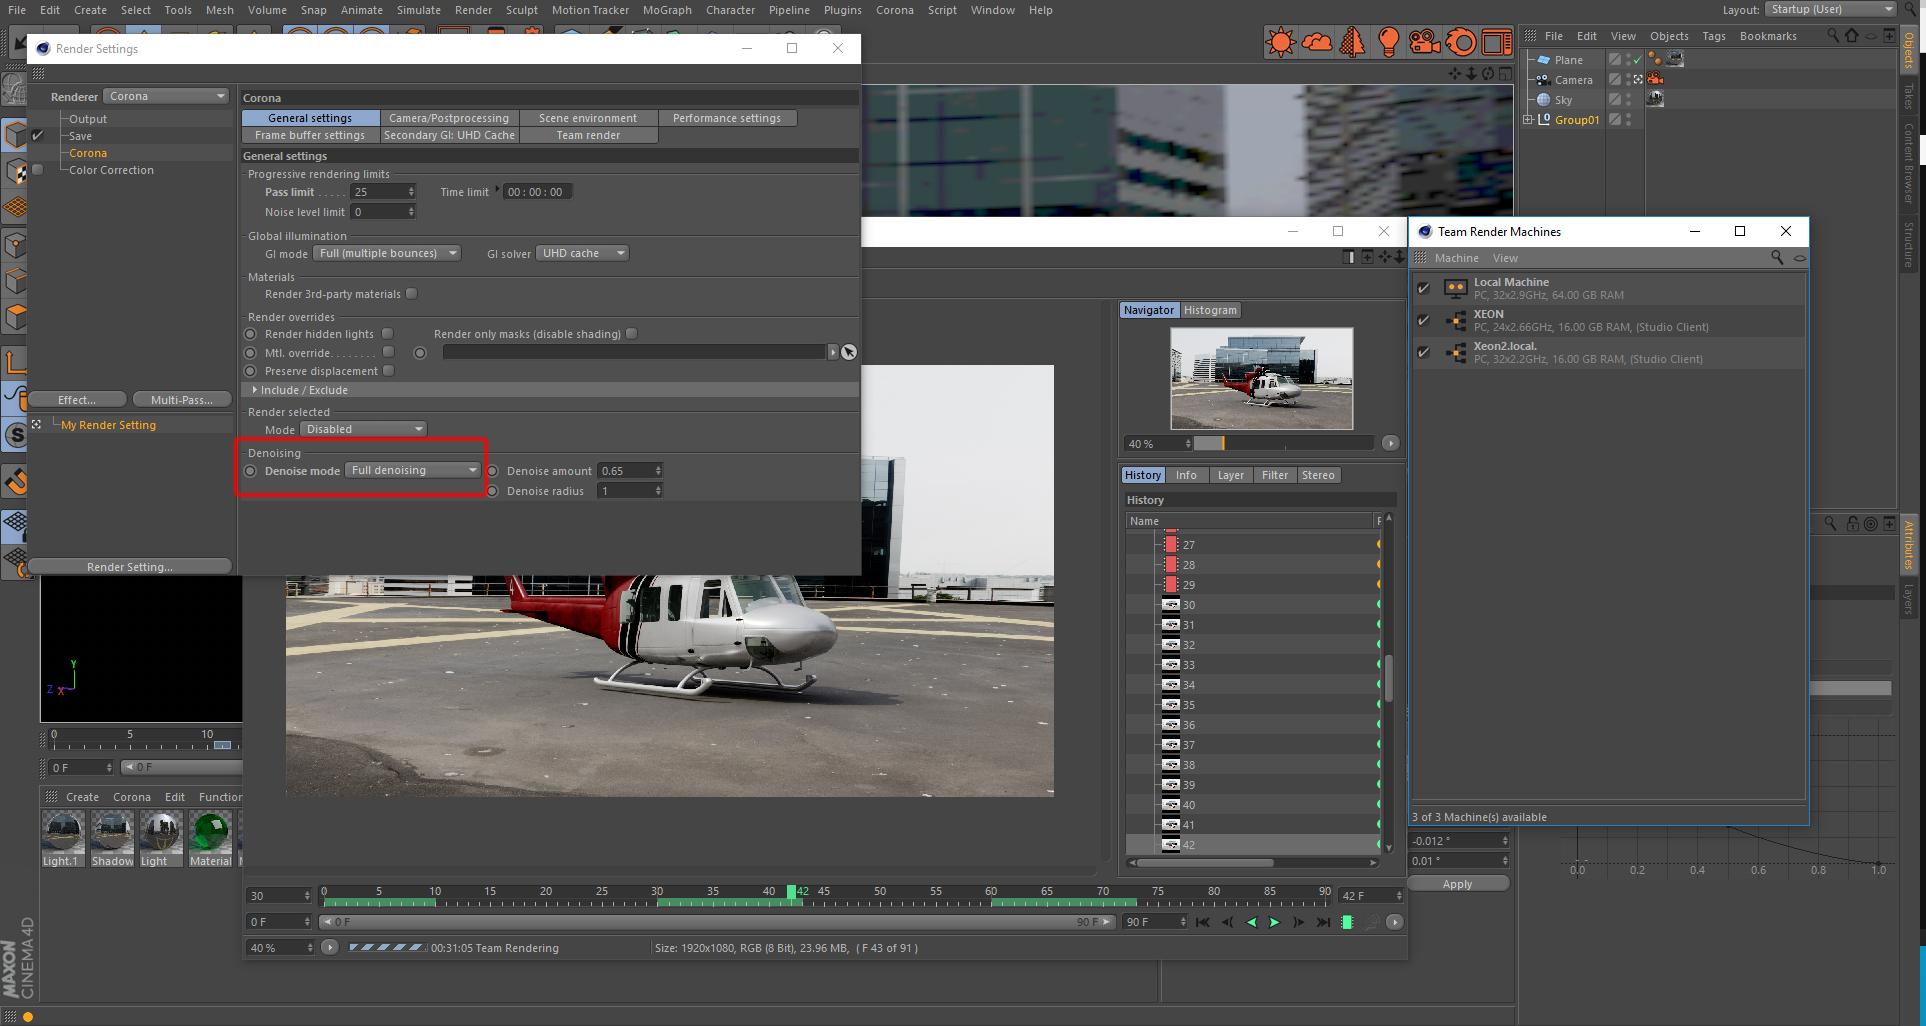 Corona Renderer for Cinema 4D, Beta 2 Released! | Corona